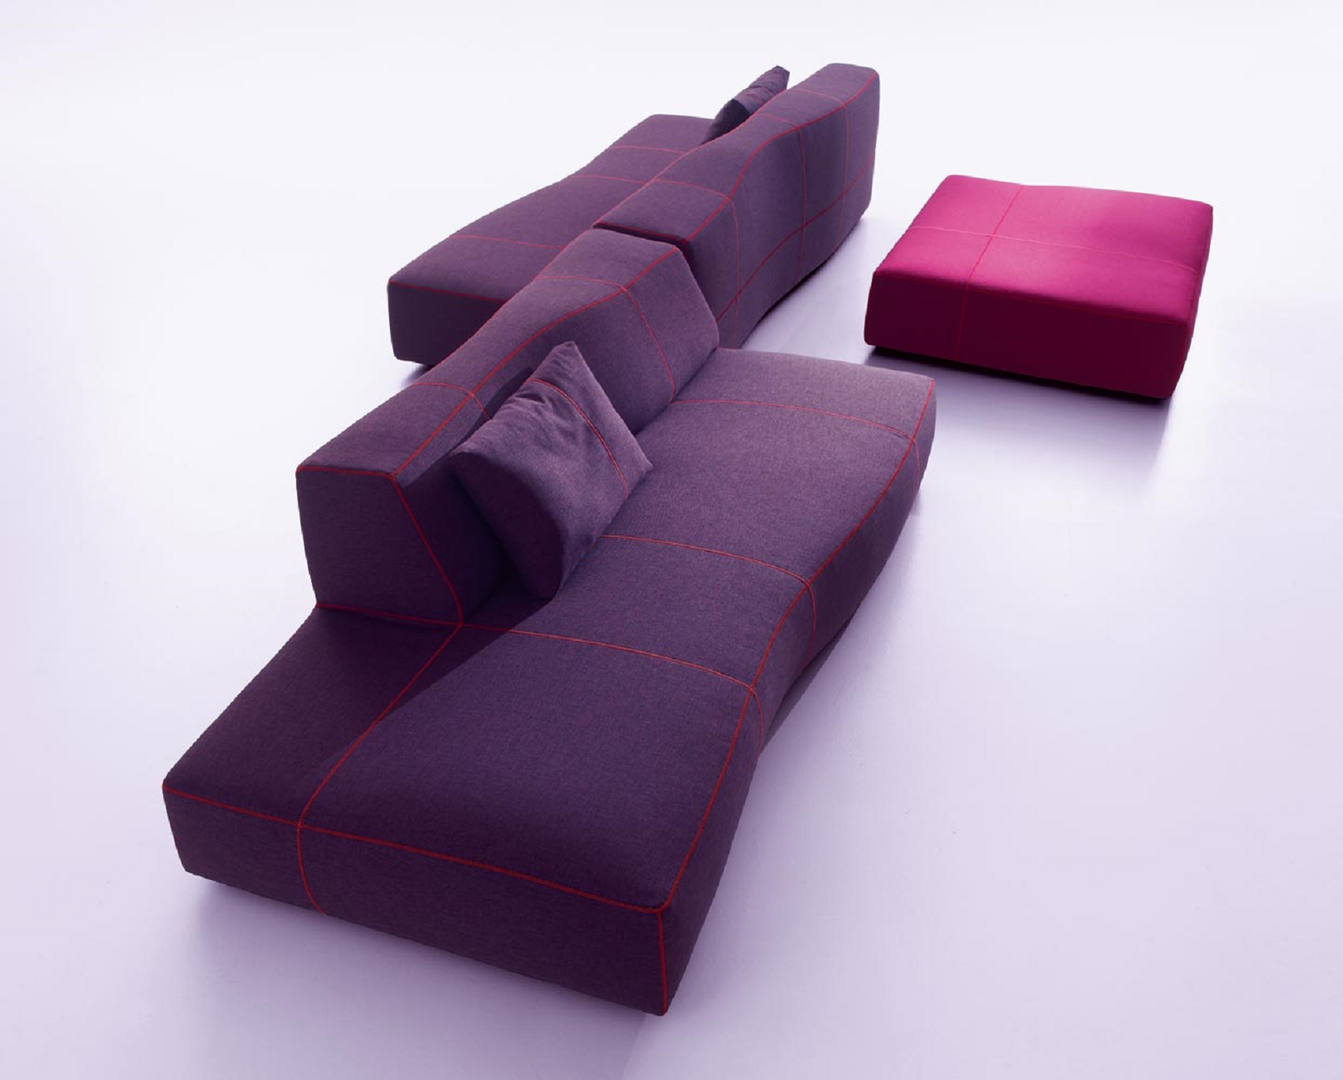 Bend-sofa2.png